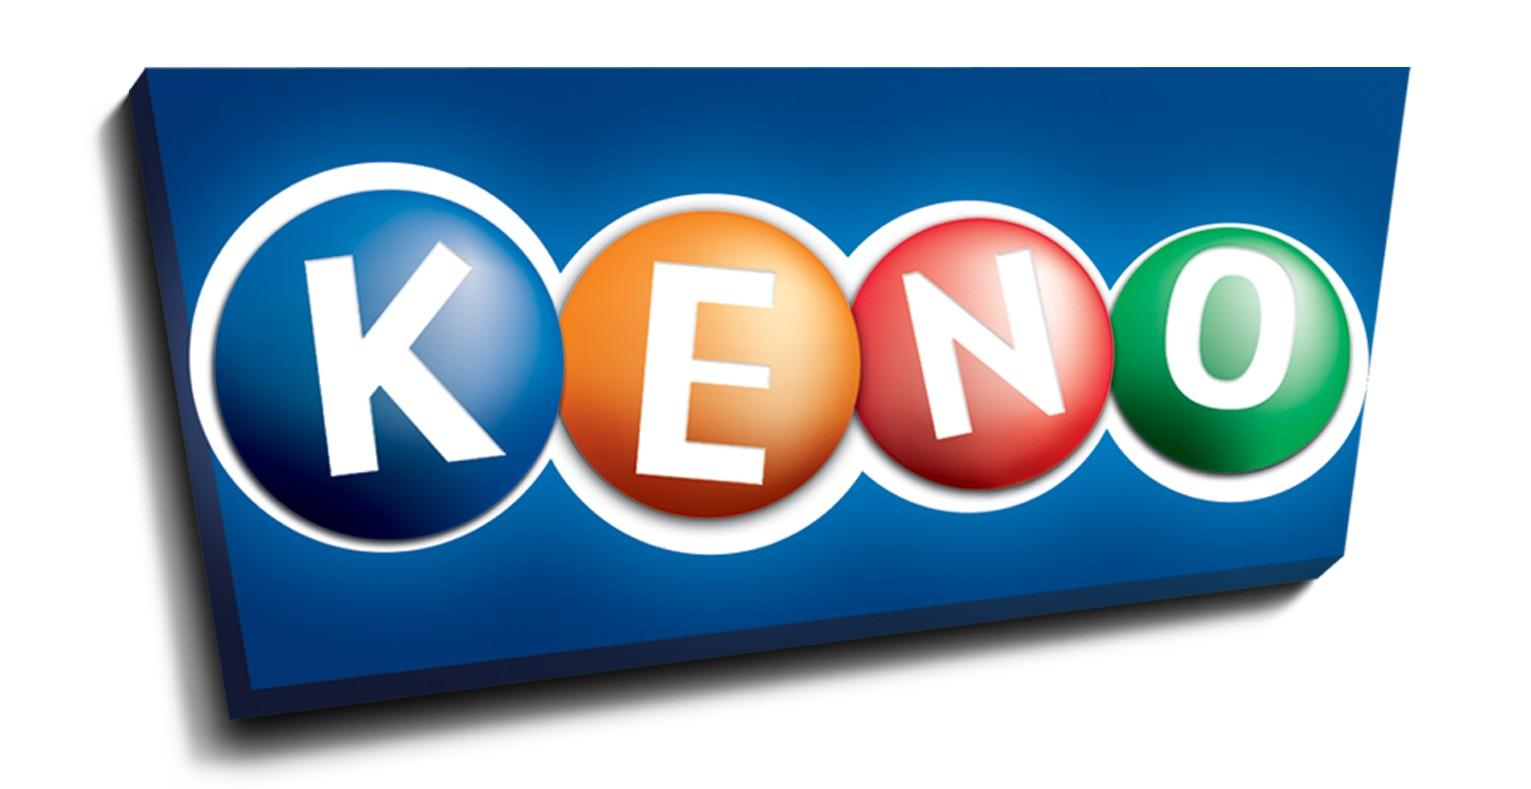 The Multiple Ticket In Keno